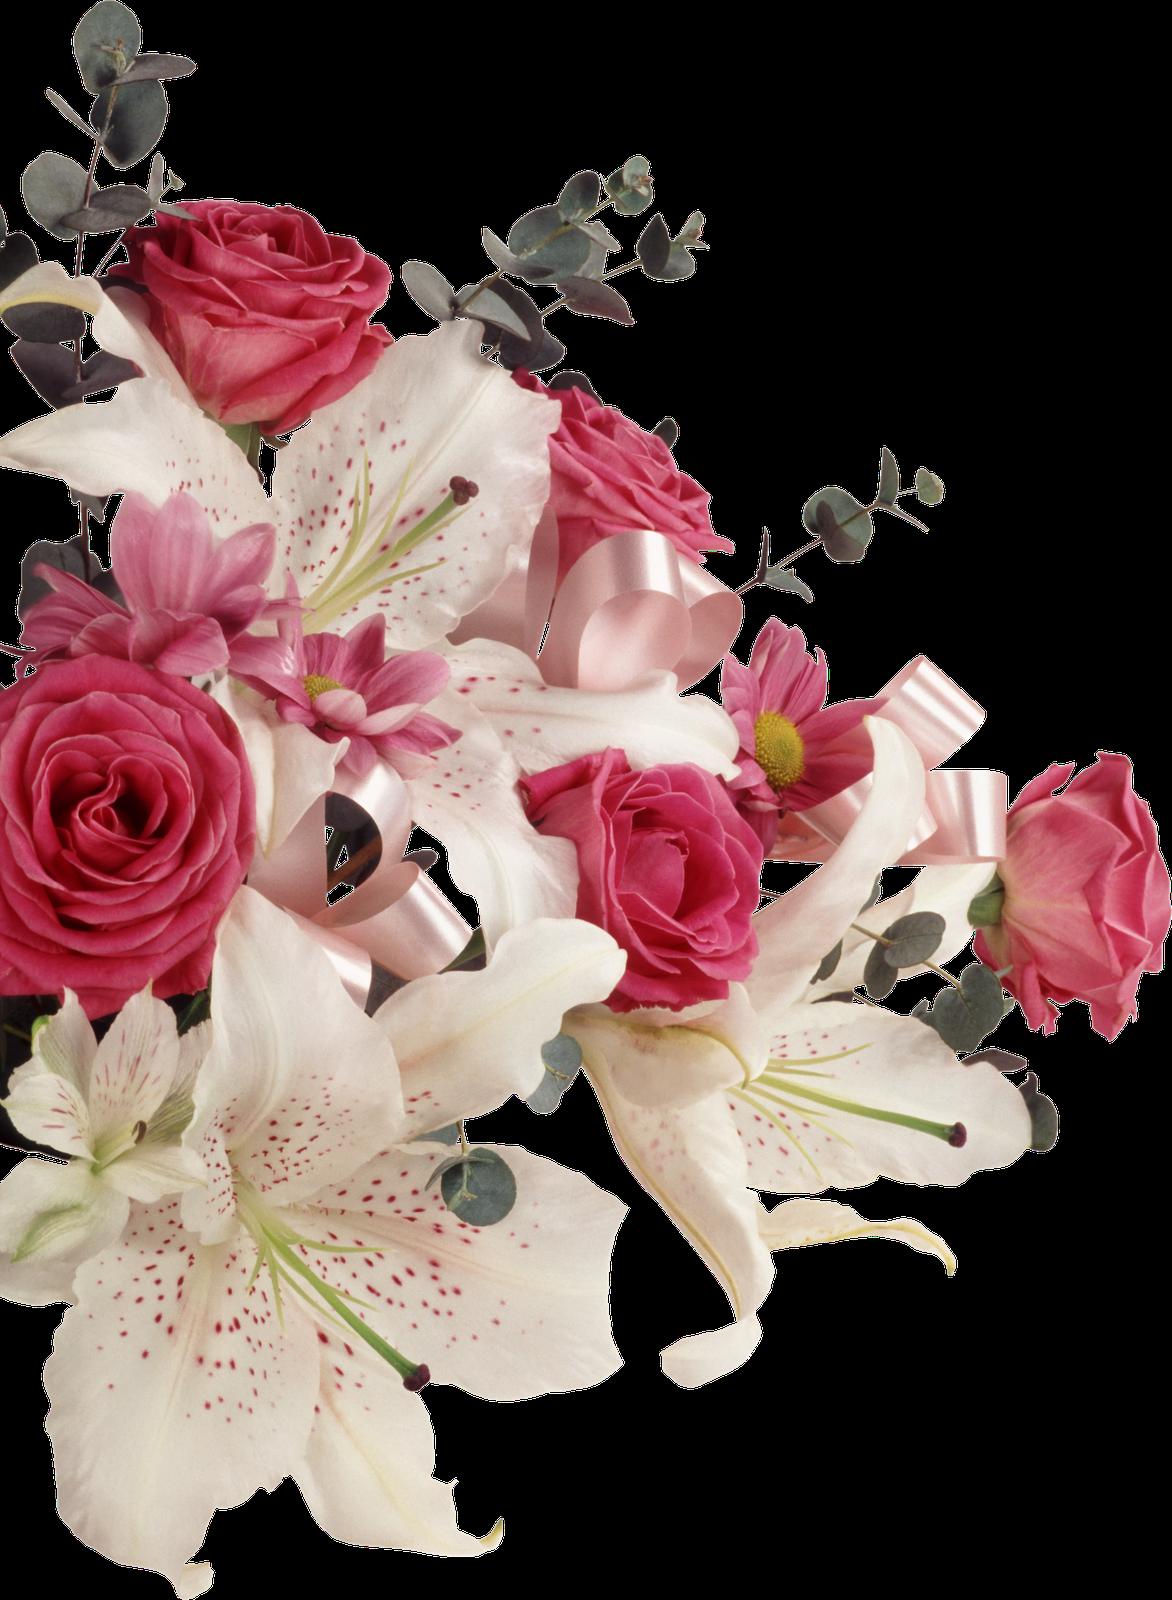 Pin By Elaine Krkl On Flowers Pinterest